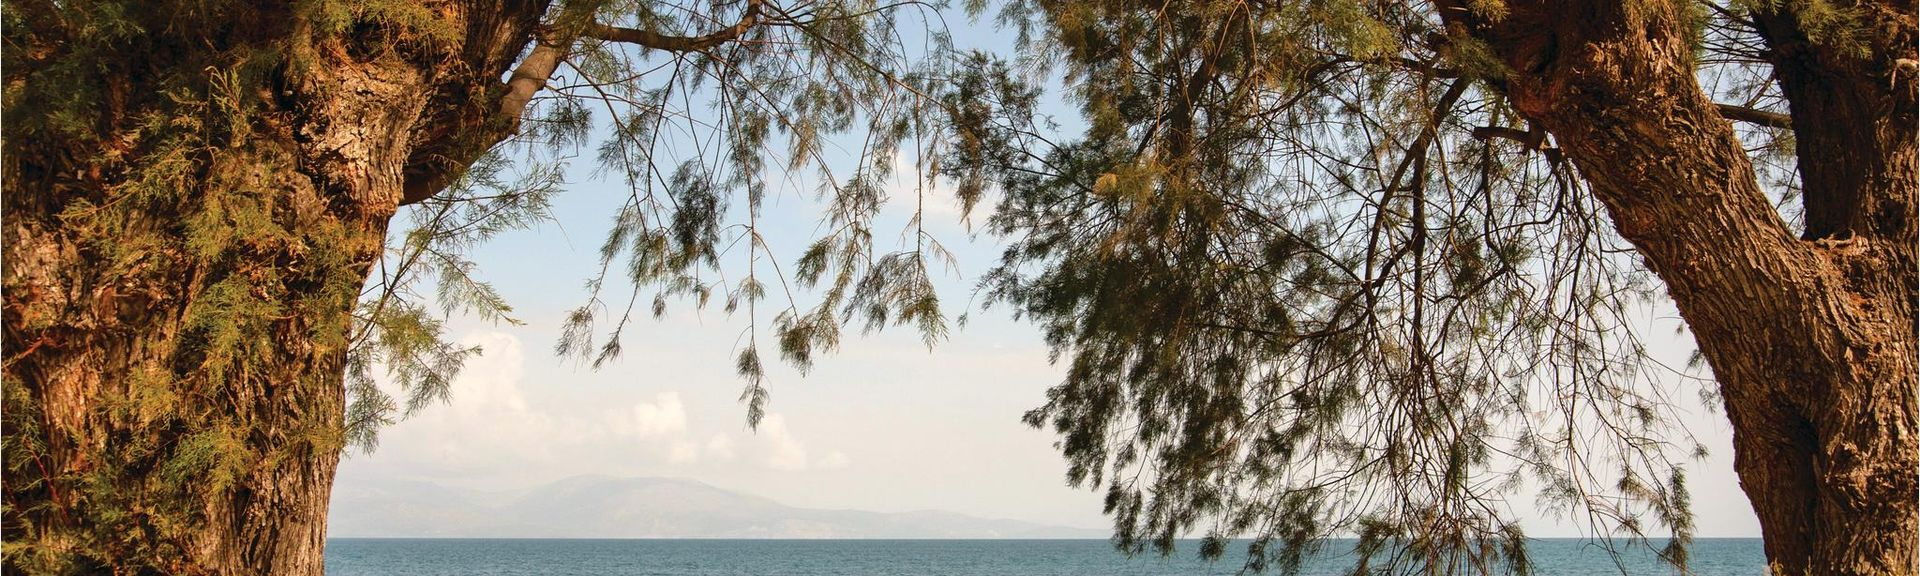 Selianitika Beach, Aigialeia, Greece